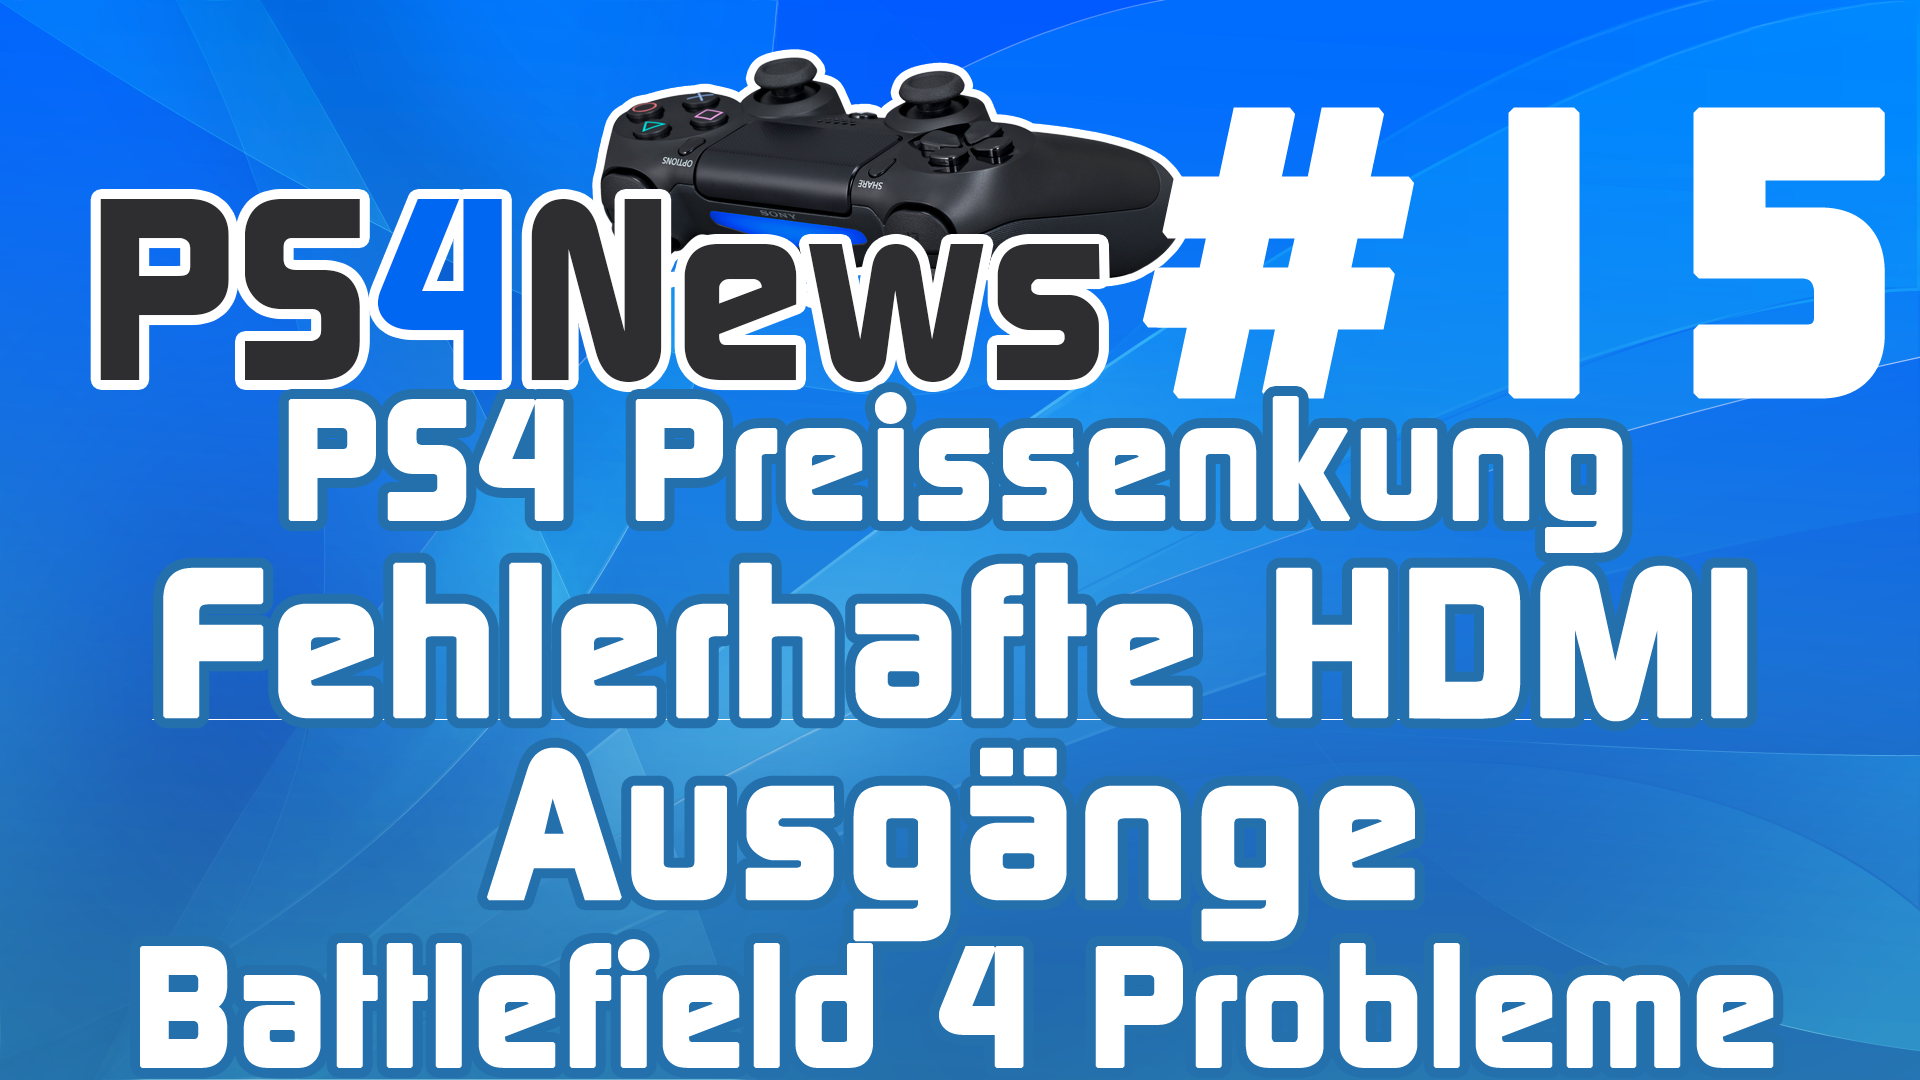 PlayStation 4 mit fehlerhaften HDMI-Ports – Die PS4 News des Tages